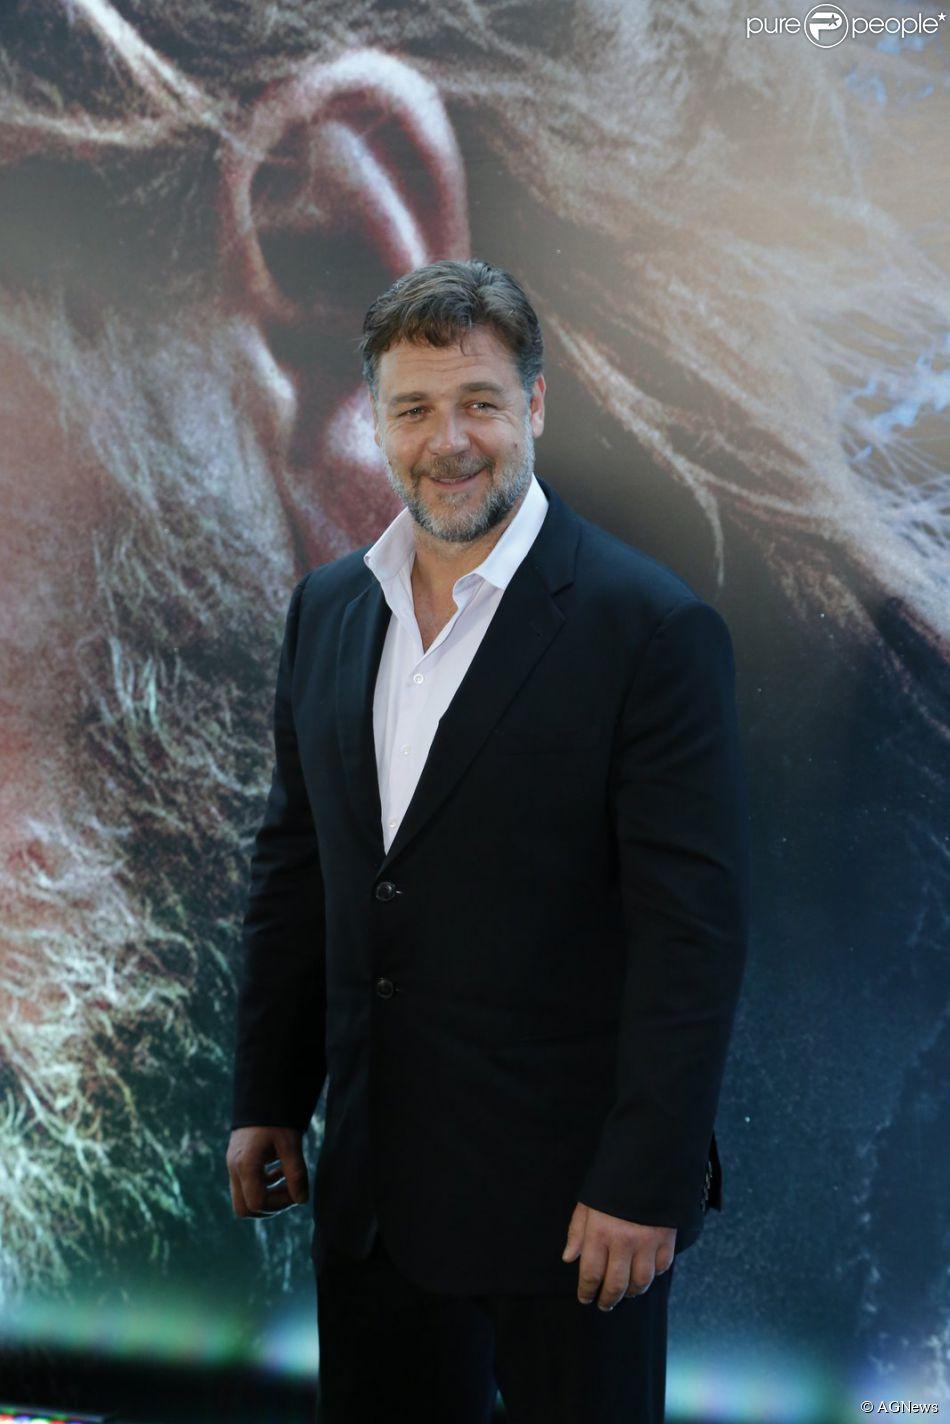 'Noé', filme de Russel Crowe, foi proibido de passar na Indonésia